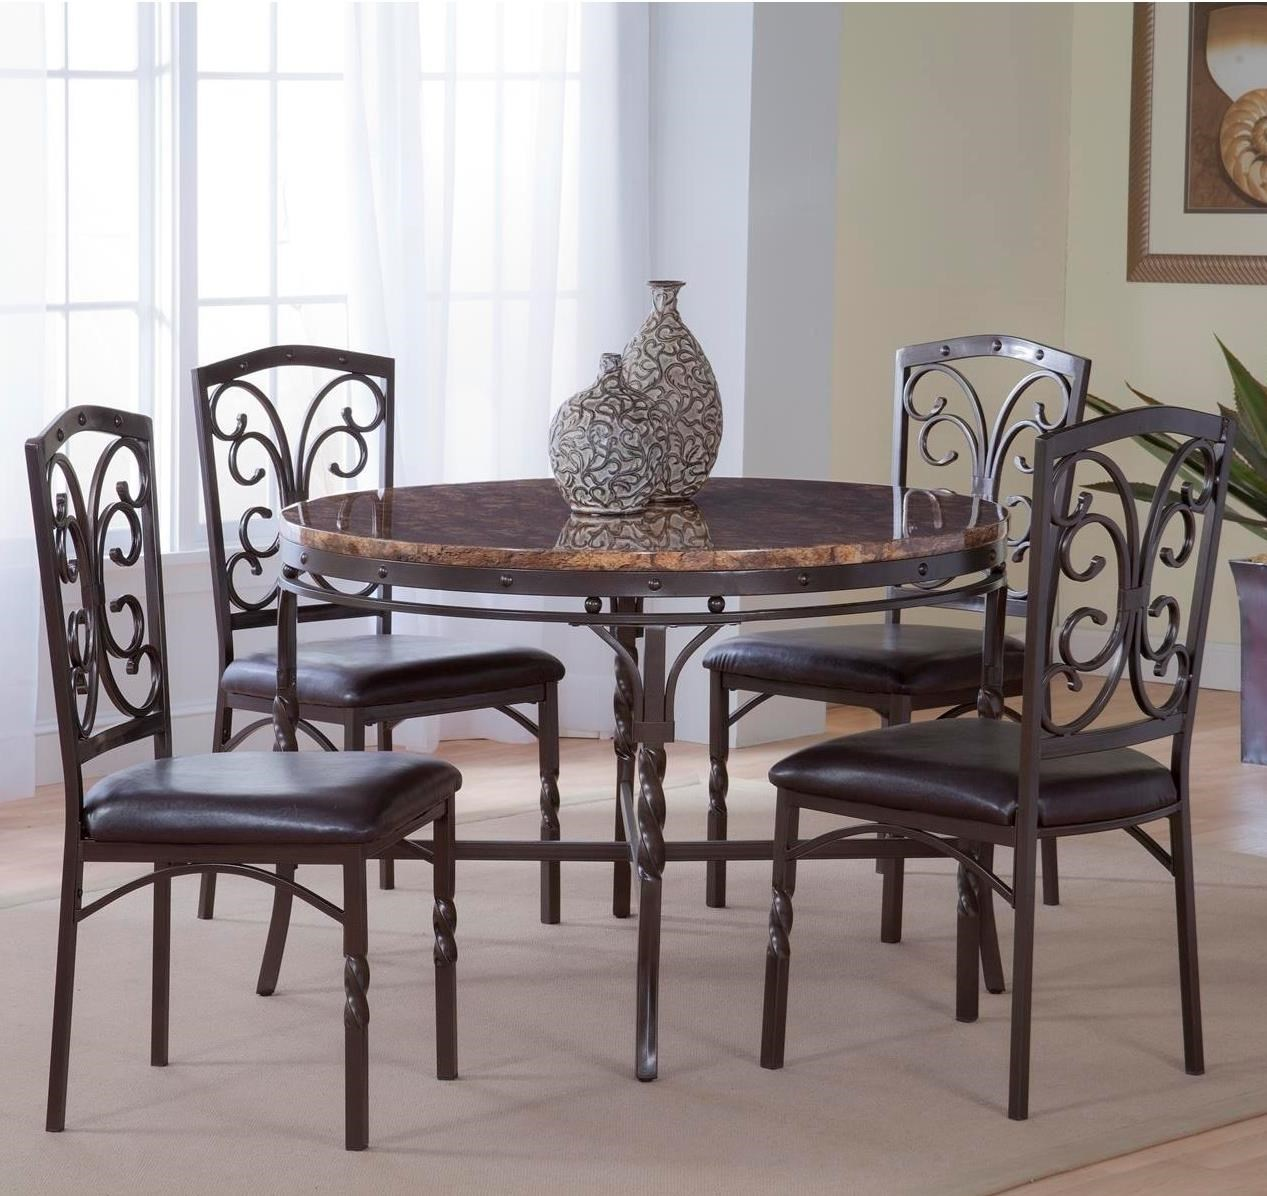 Bernards Tuscan 5-Piece Metal/Faux Marble Dinette Table Set & Bernards Tuscan 5-Piece Metal/Faux Marble Dinette Table Set ...